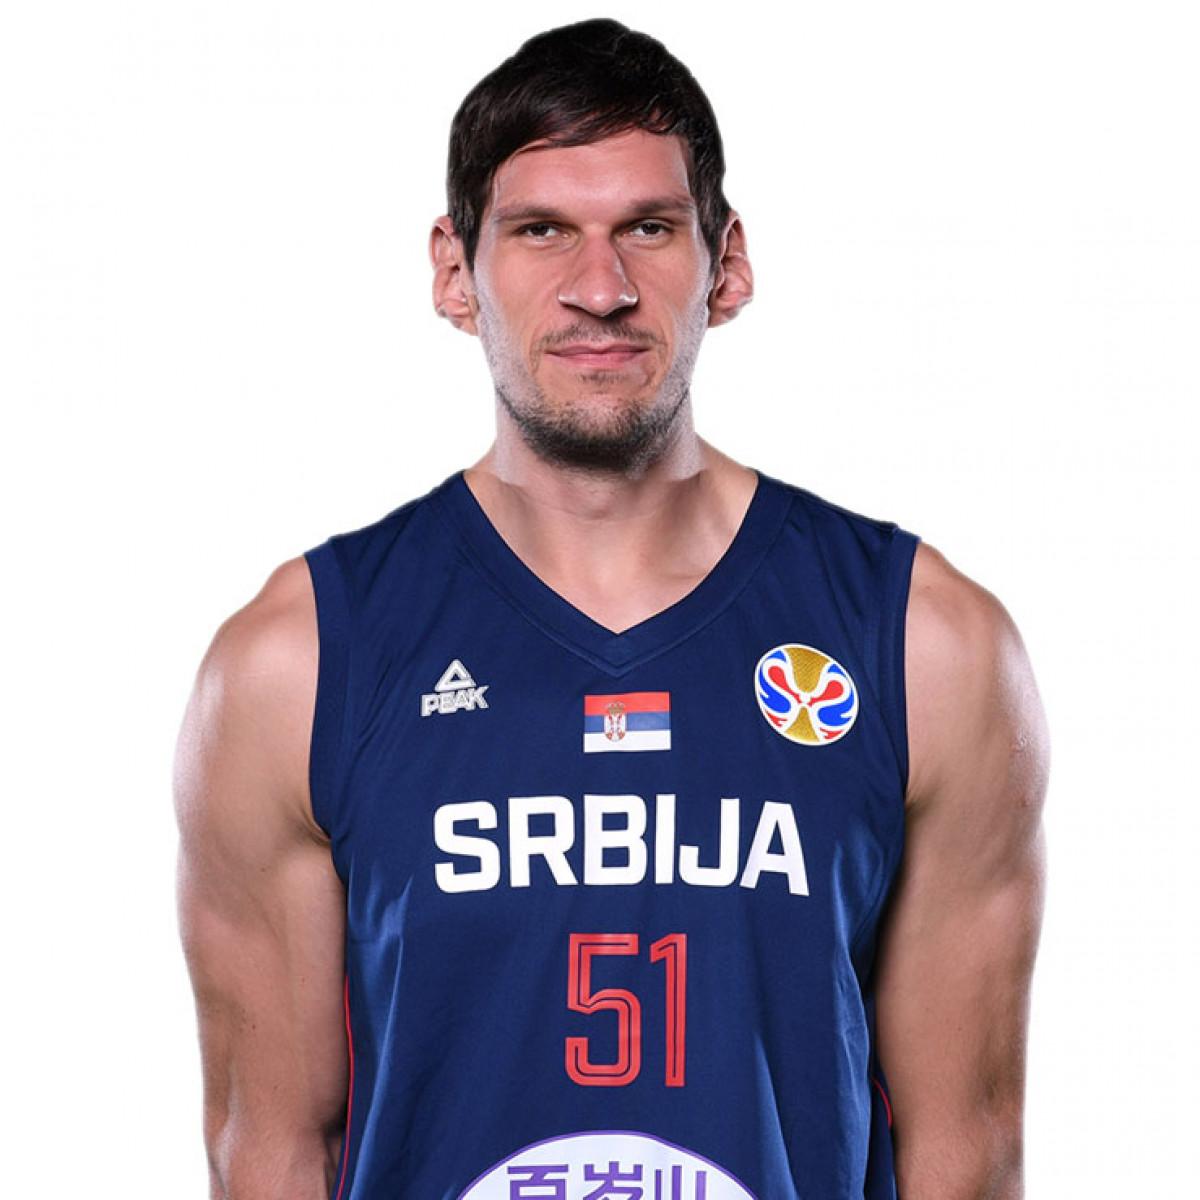 Photo of Boban Marjanovic, 2019-2020 season